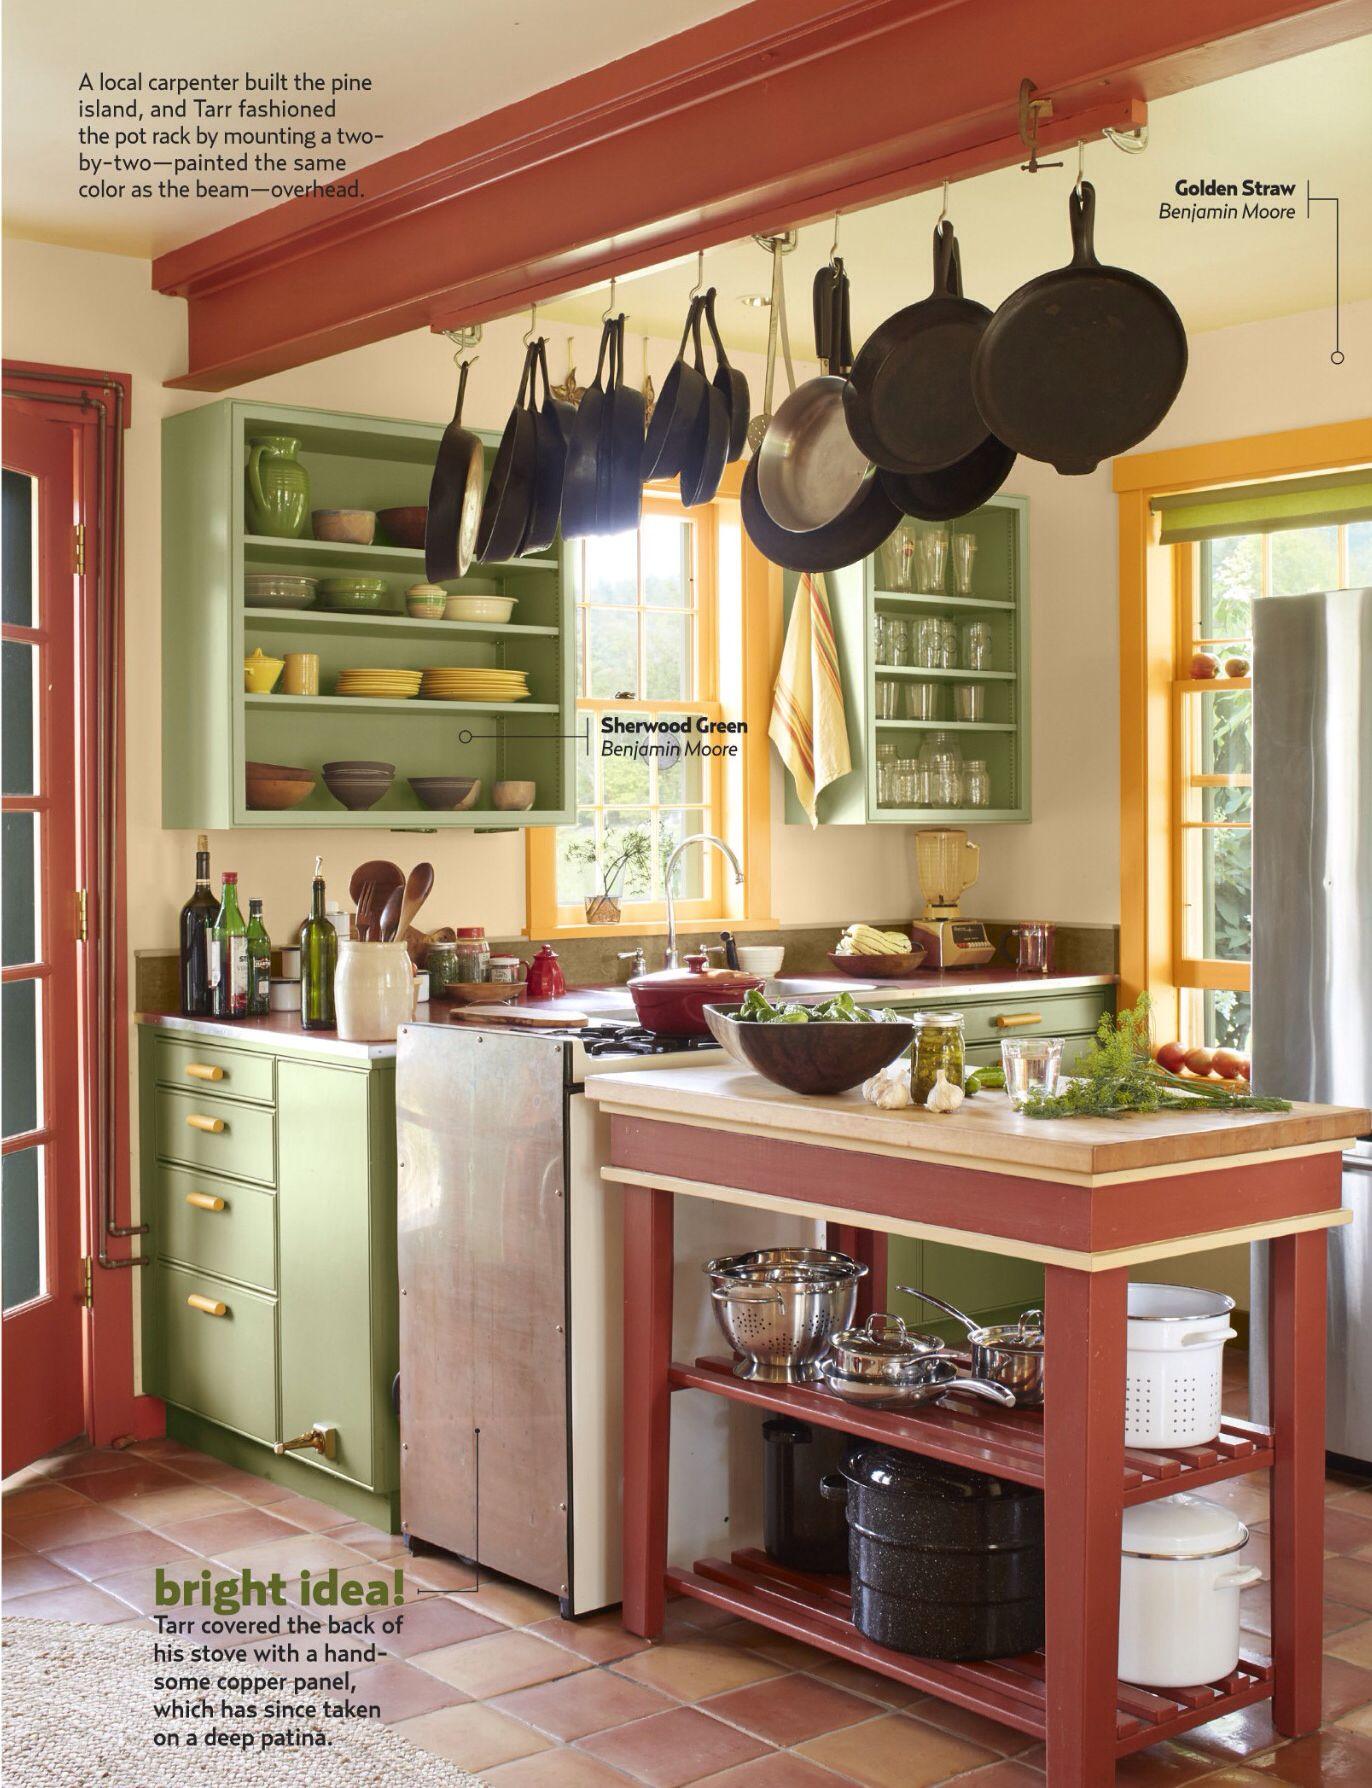 Two window kitchen design  love this kitchen  kitchens to love  pinterest  kitchens and house